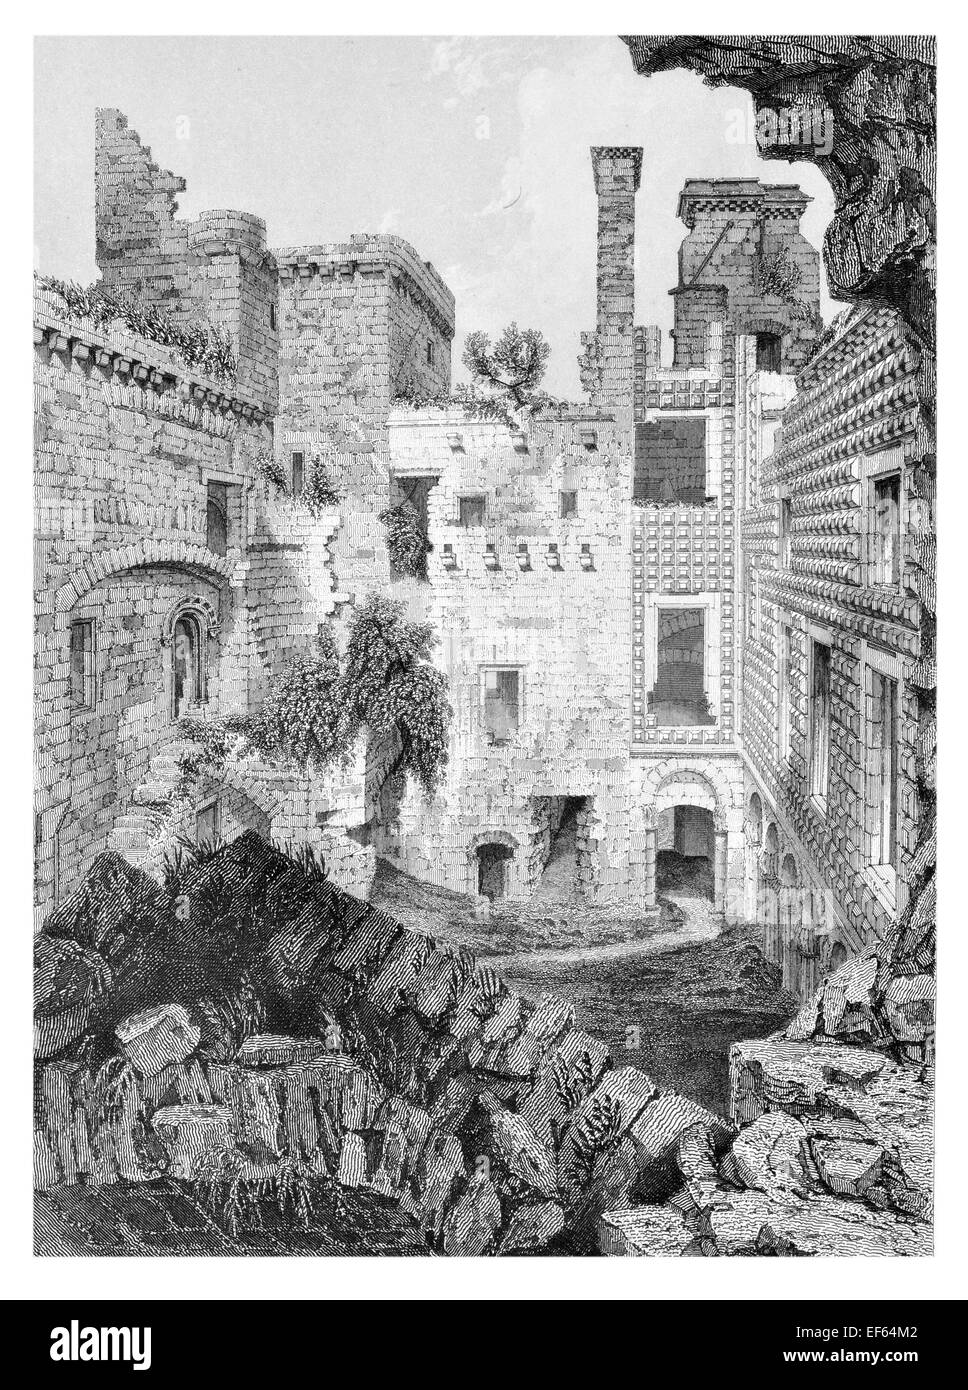 1852 Court Yard Crichton  ruined Castle Pathhead, Midlothian - Stock Image